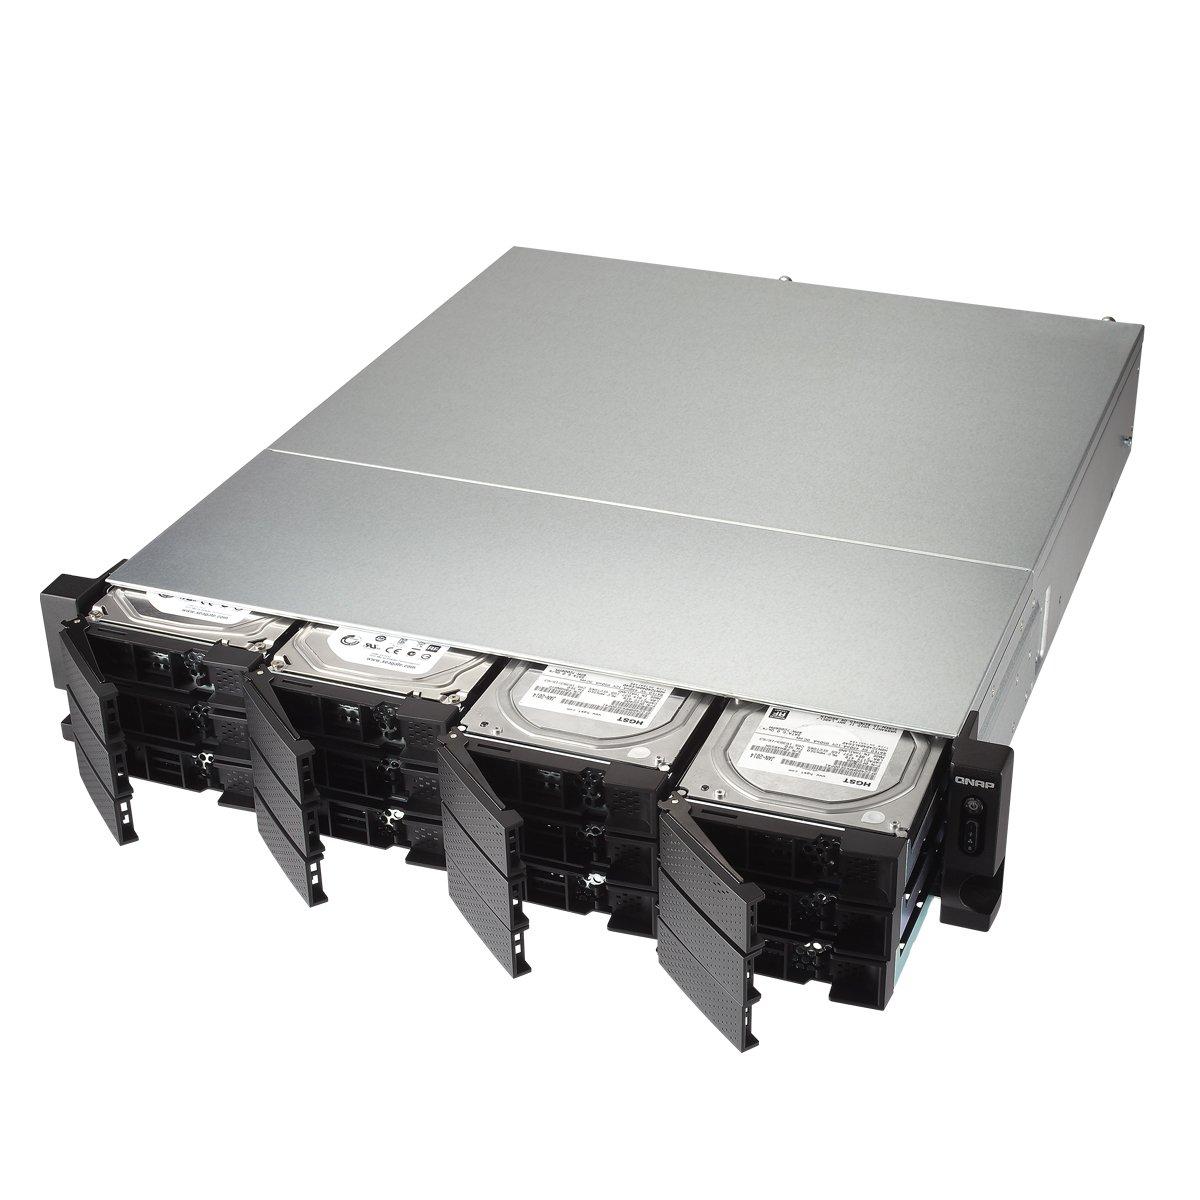 Qnap TS-1231XU-4G-US 12-Bay ARM-based 10G NAS, Quad Core 1.7GHz, 4GB DDR3 RAM, 2 x 10GbE SFP+, 2 x GbE, Single Power Supply by QNAP (Image #2)